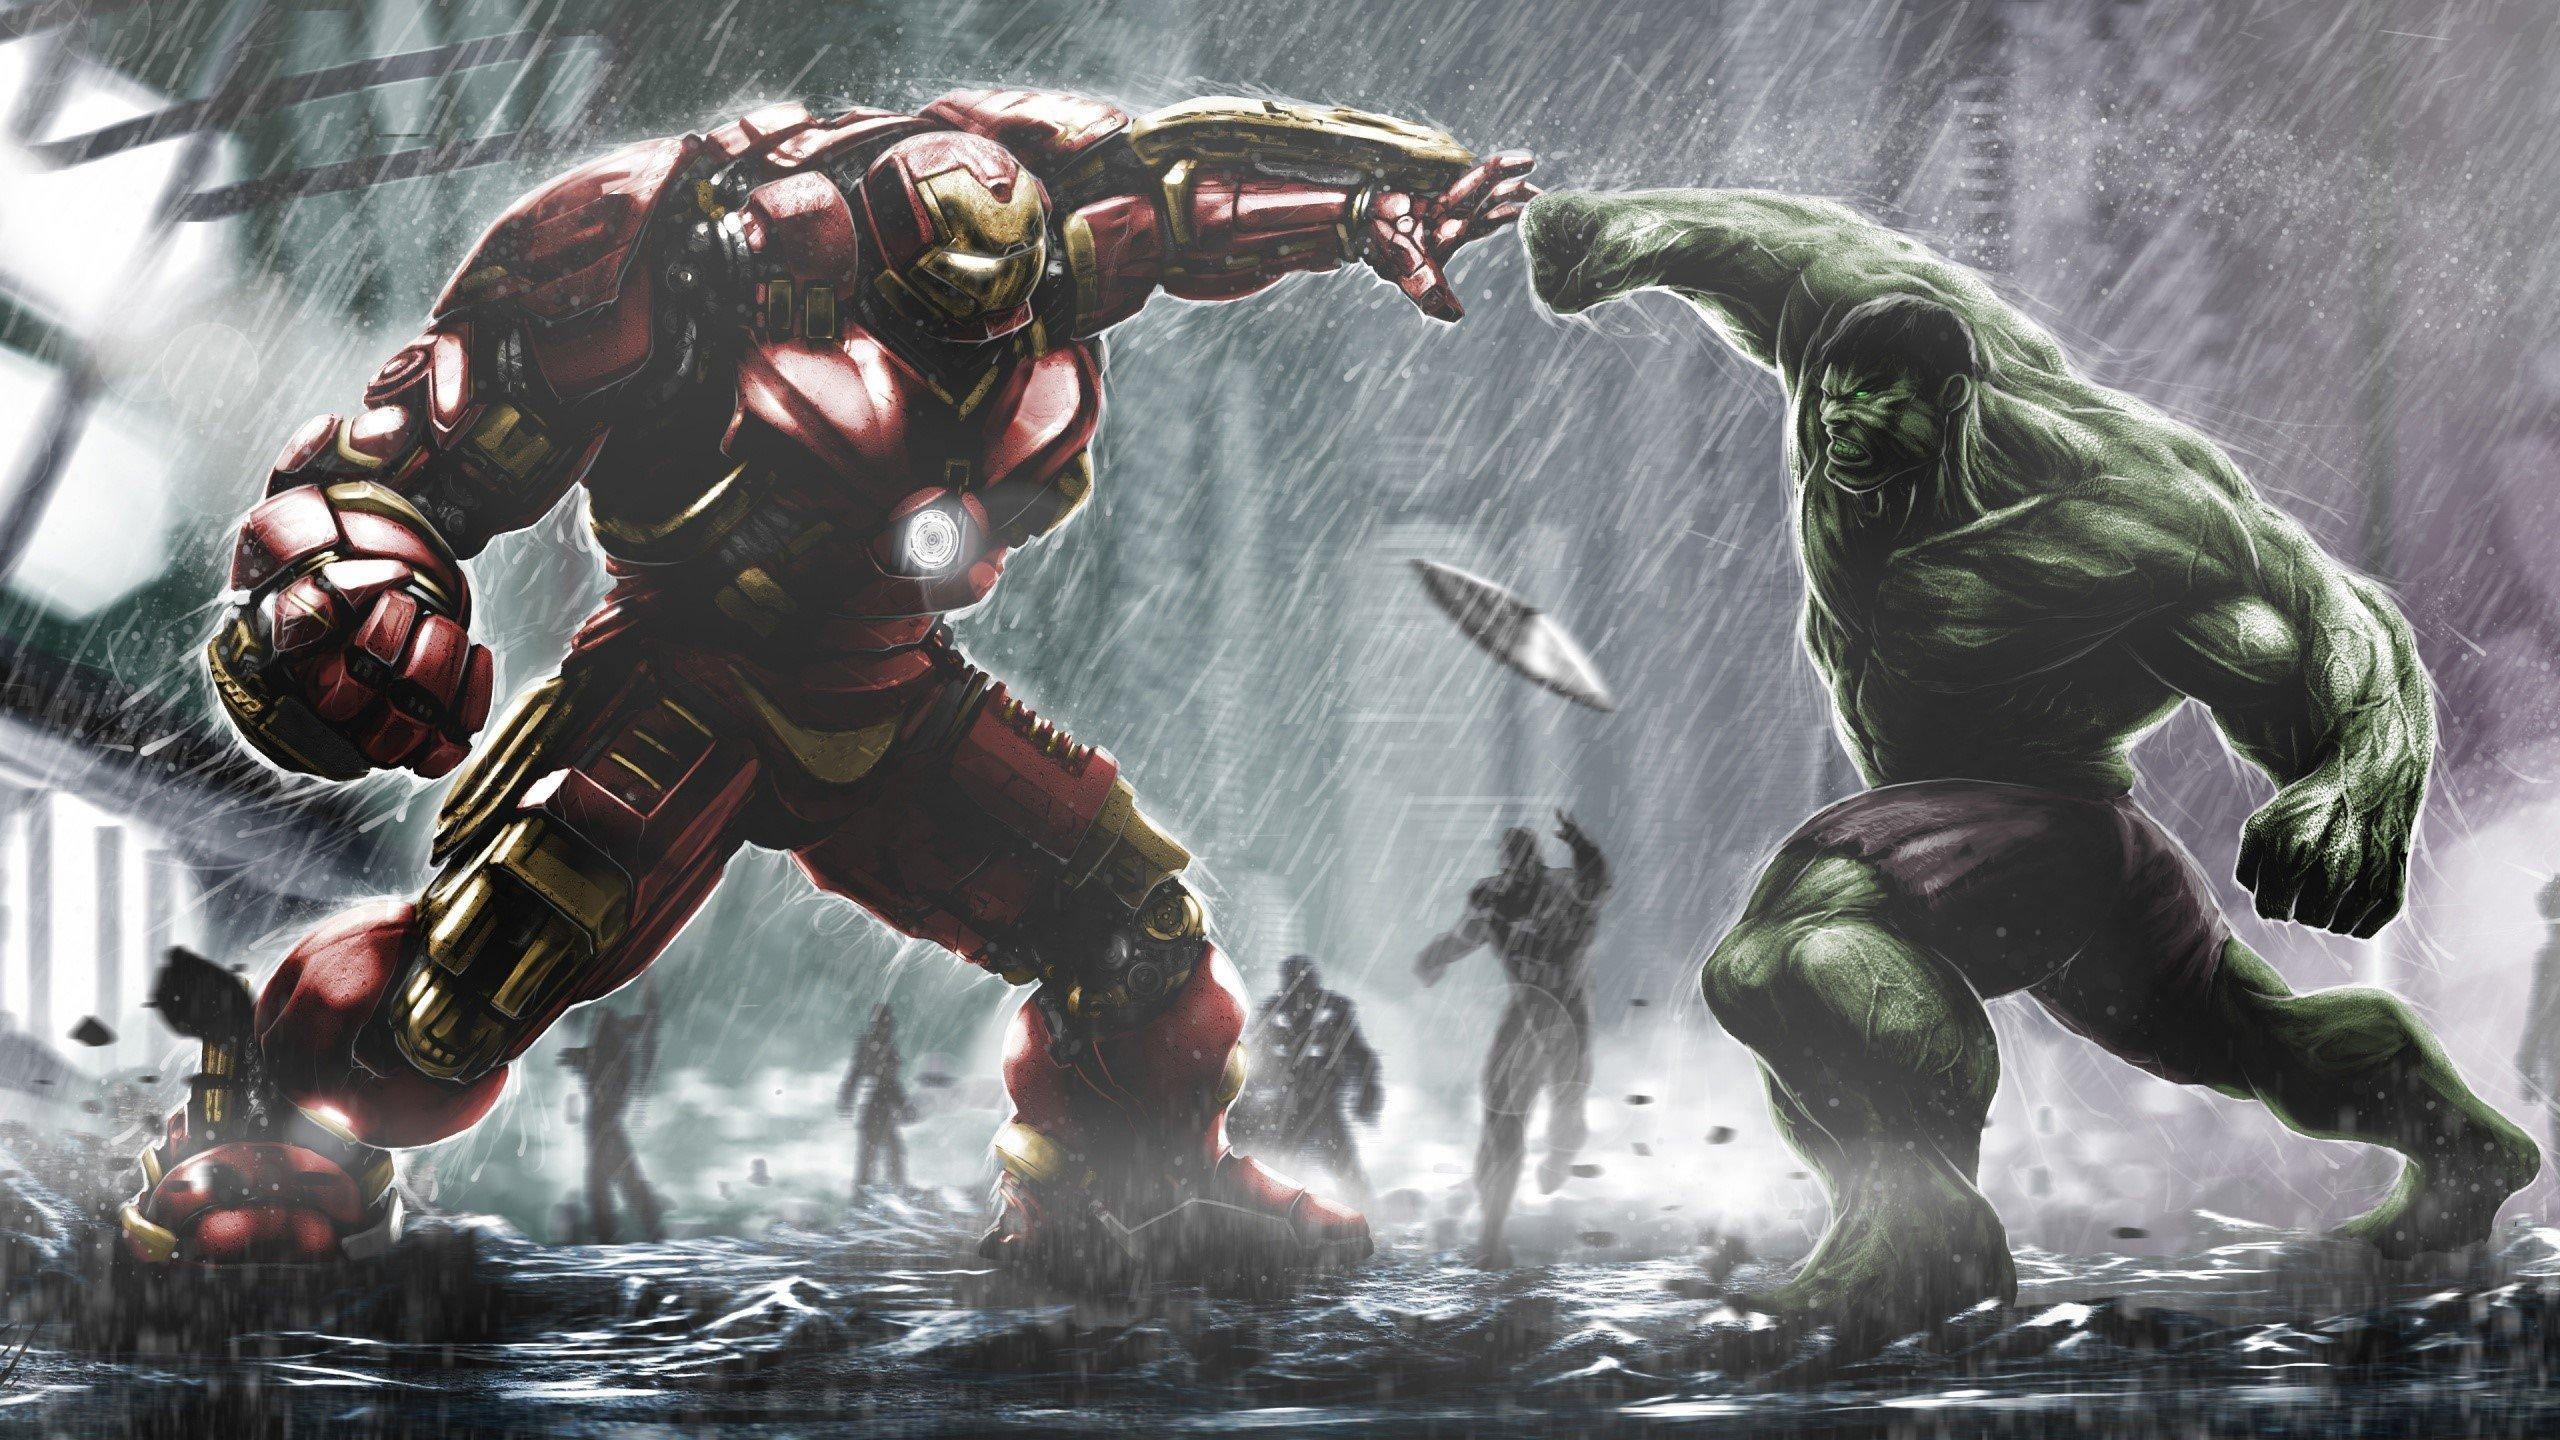 Wallpaper Hulkbuster against Hulk